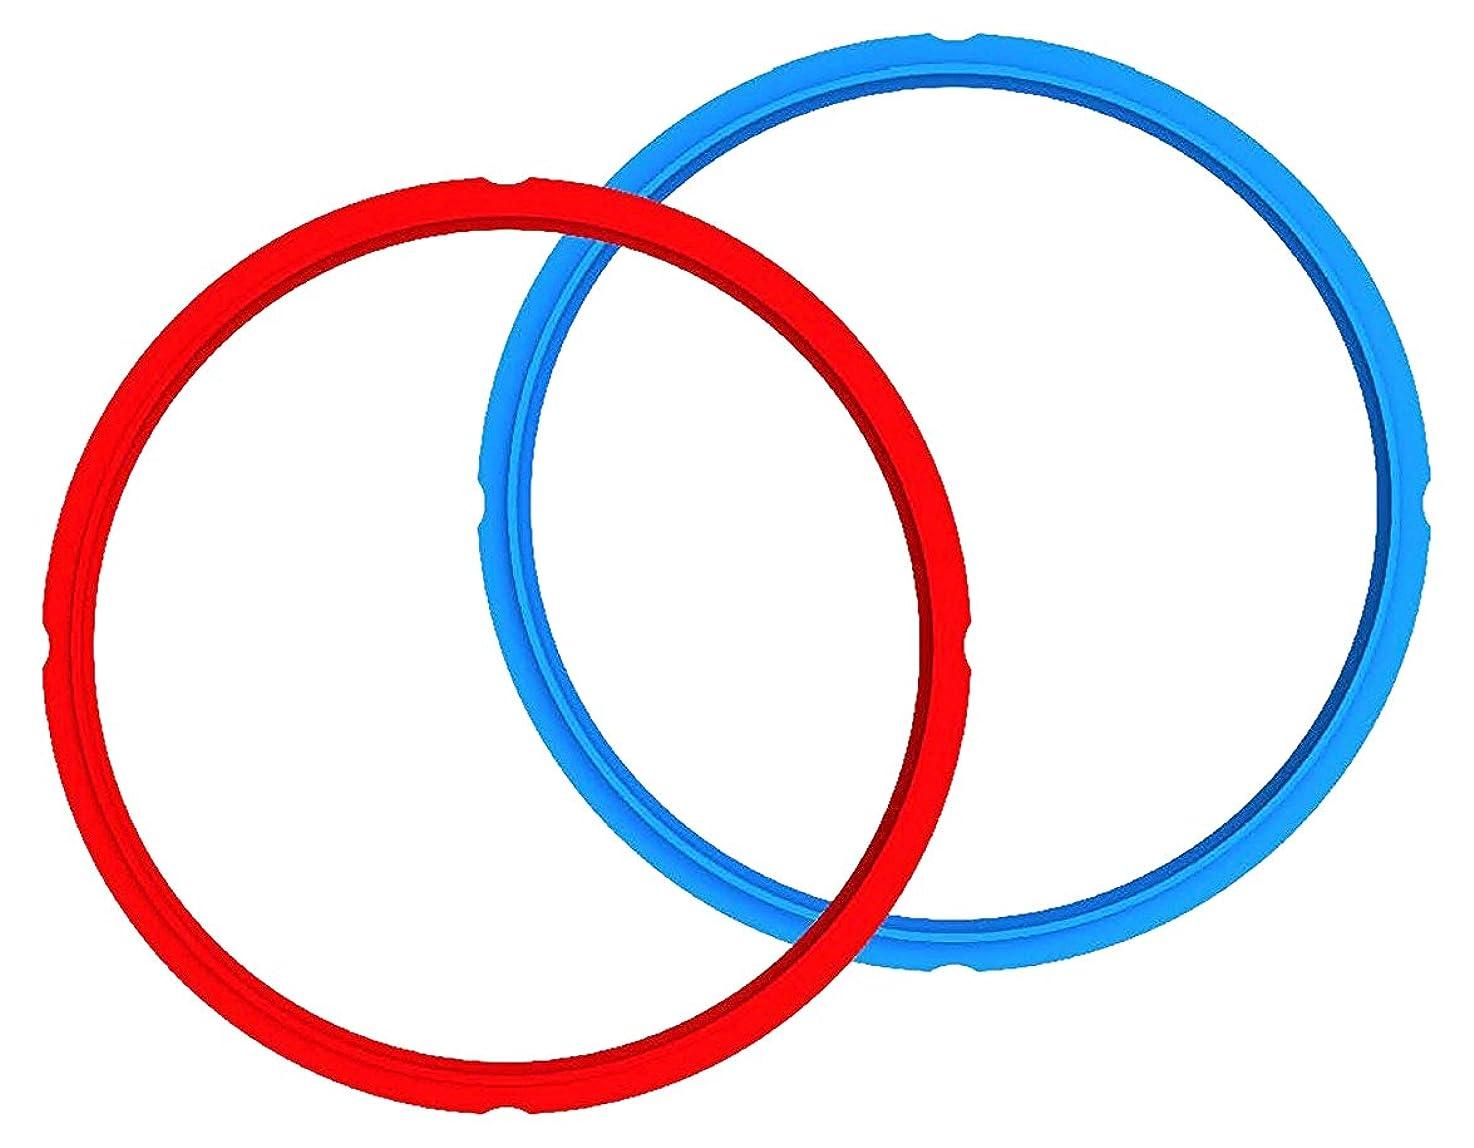 Genuine Instant Pot Sealing Ring 2-Pack - 6 Quart Red/Blue ocokyvkewfeyl7